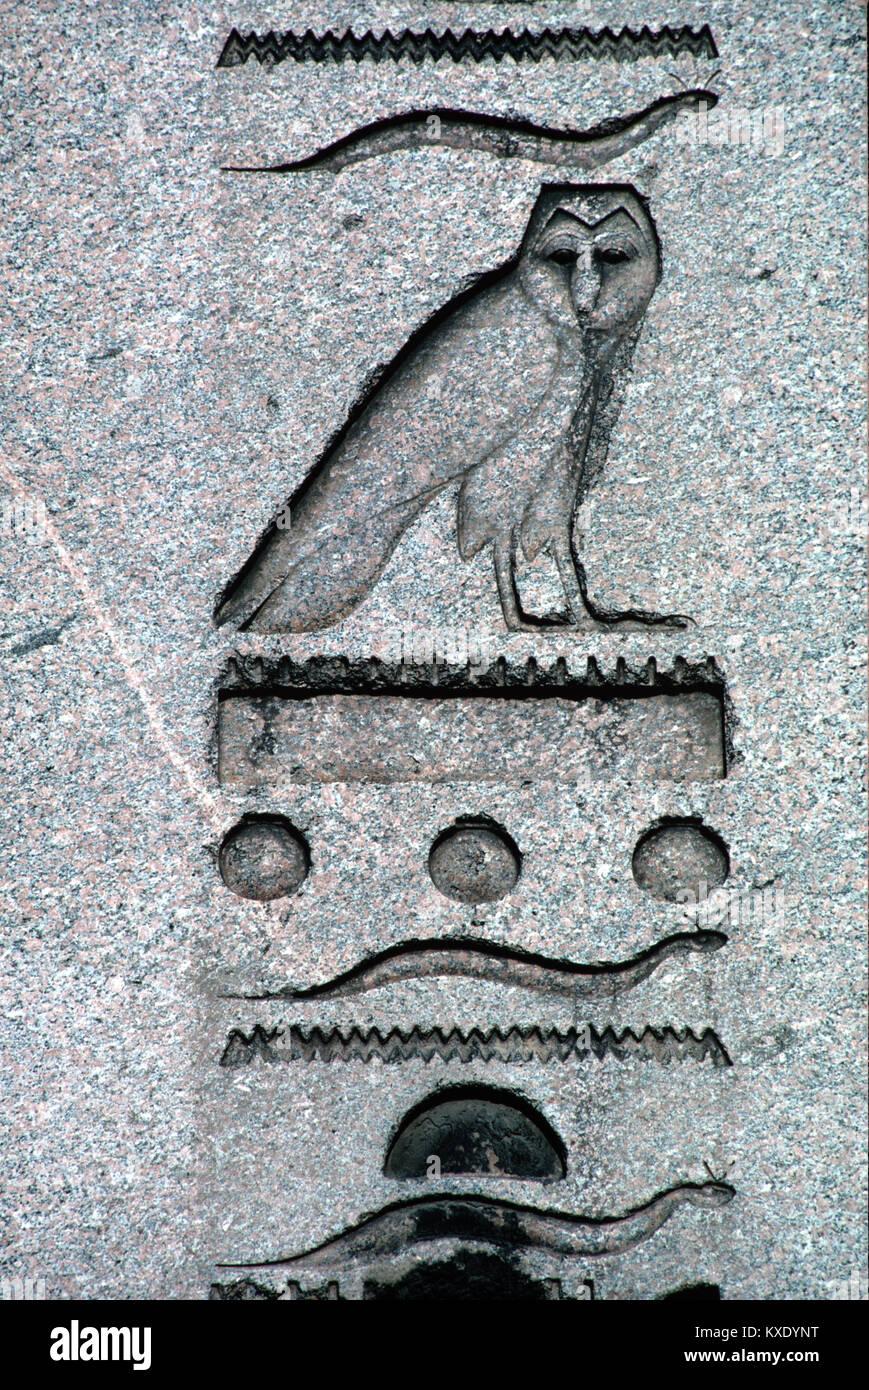 Ancient Egyptian Hieroglyphics Or Hieroglyphic Inscriptions And